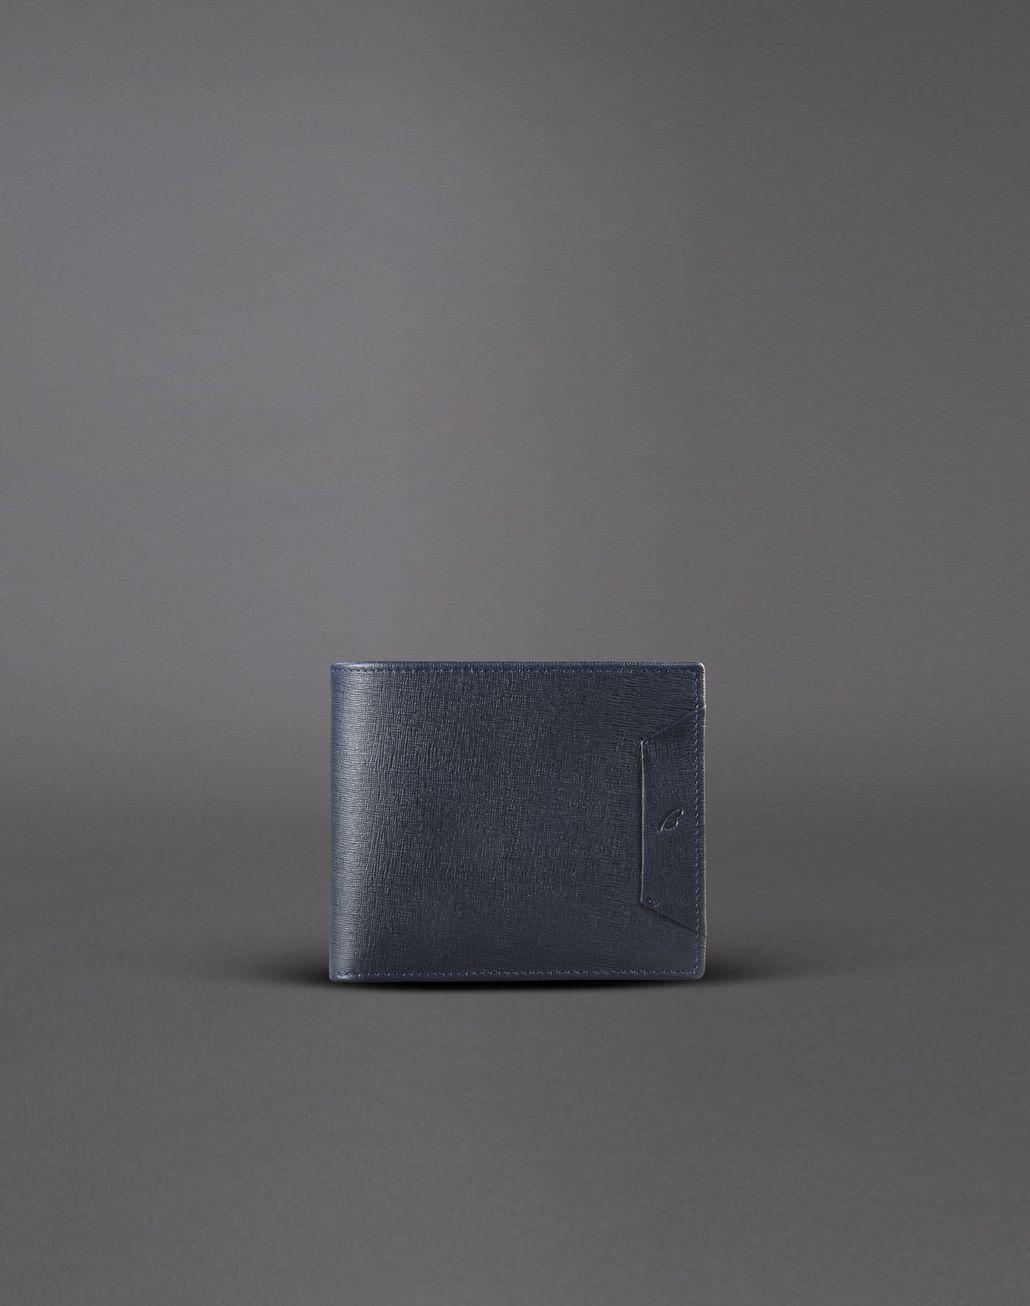 BRIONI CLASSIC SMALL LEATHER GOOD   Leather Goods U f